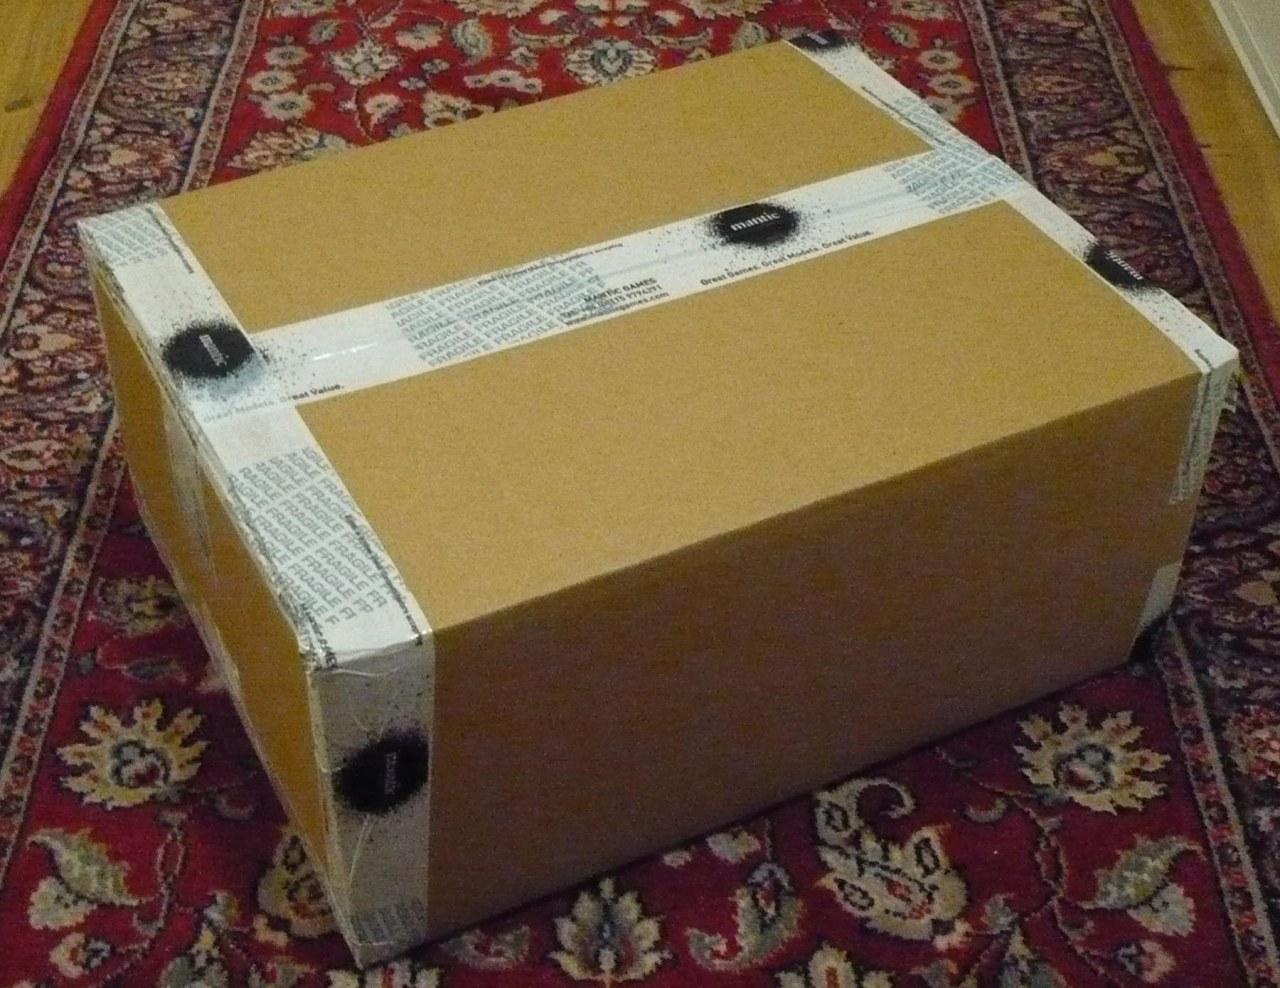 The Punishment Due: Crazy Bobby's Craaazzy Bonanza Box ofCraziness!!!!